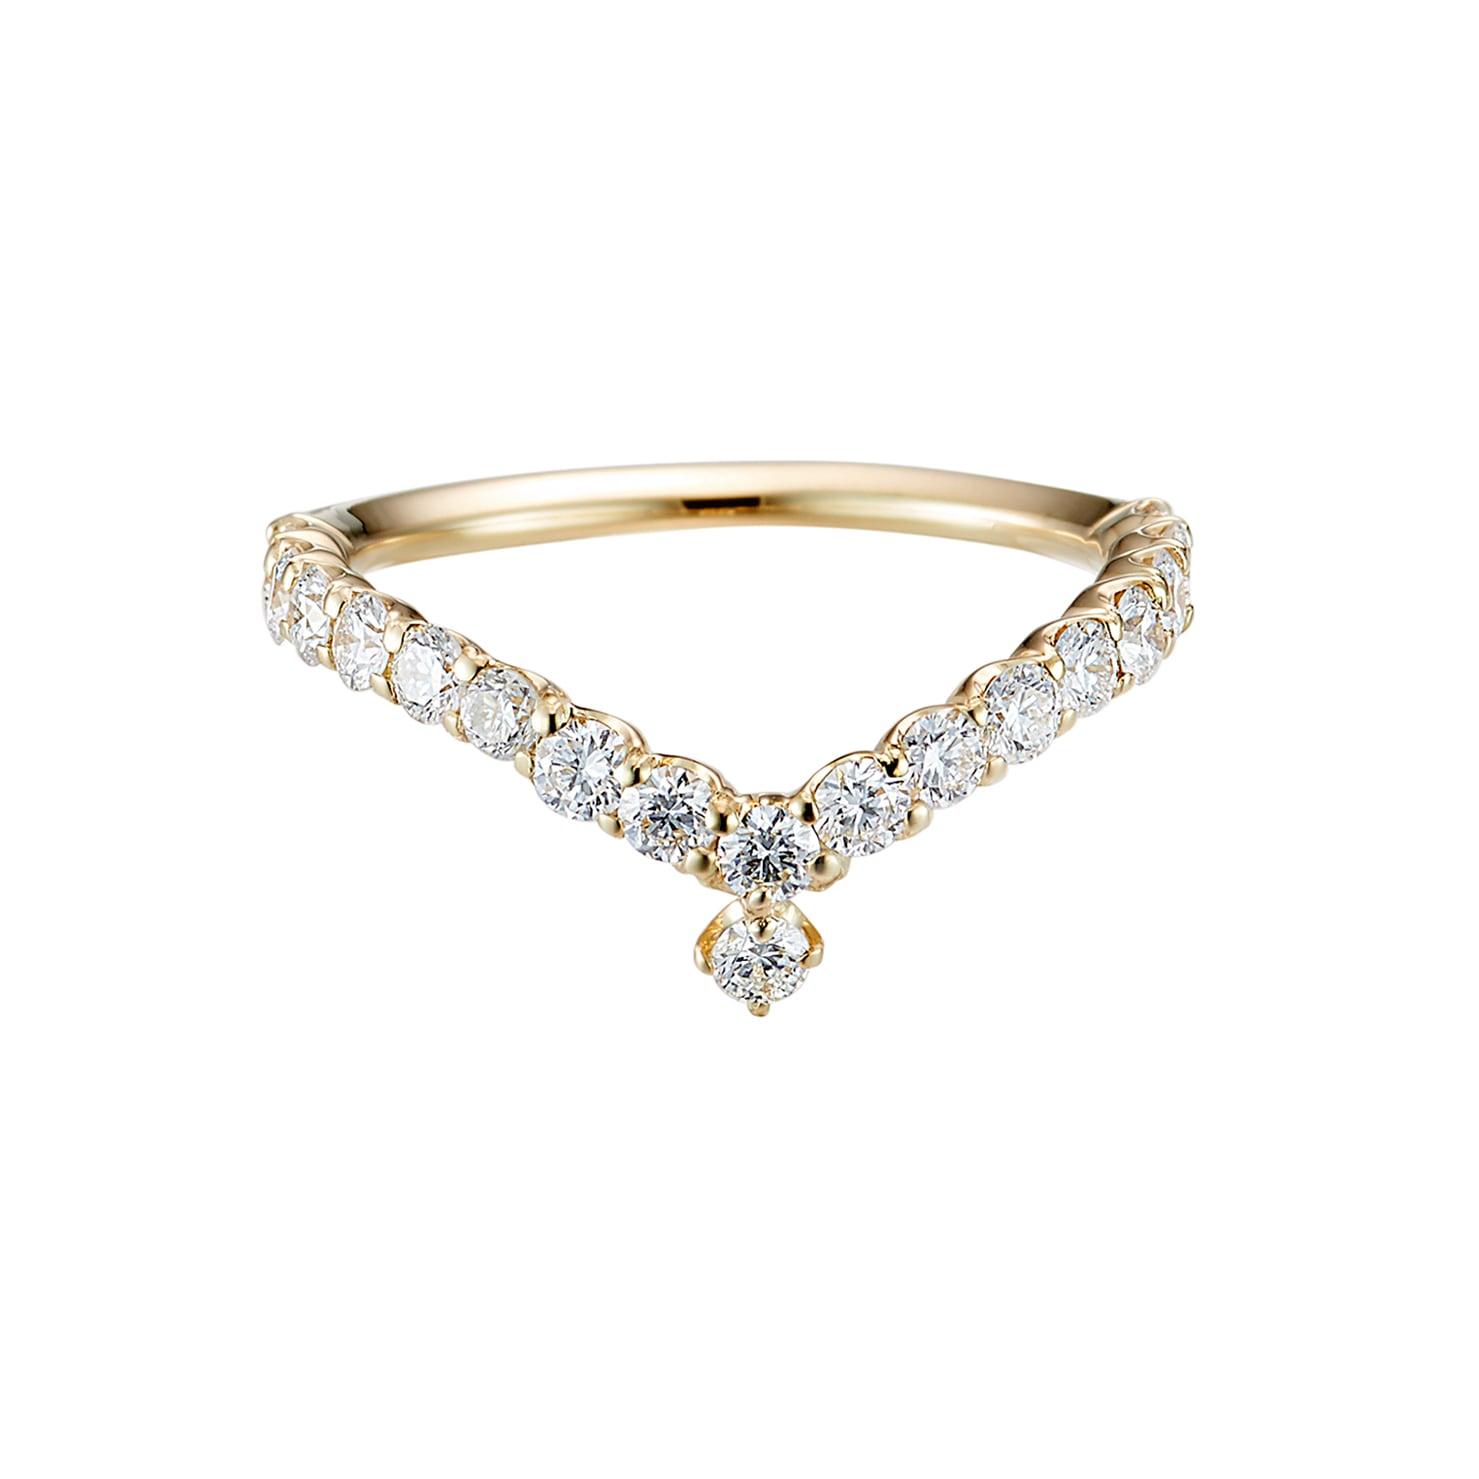 Everlasting Ring with a Diamond Drop / K18YG 3EX H&C Diamond